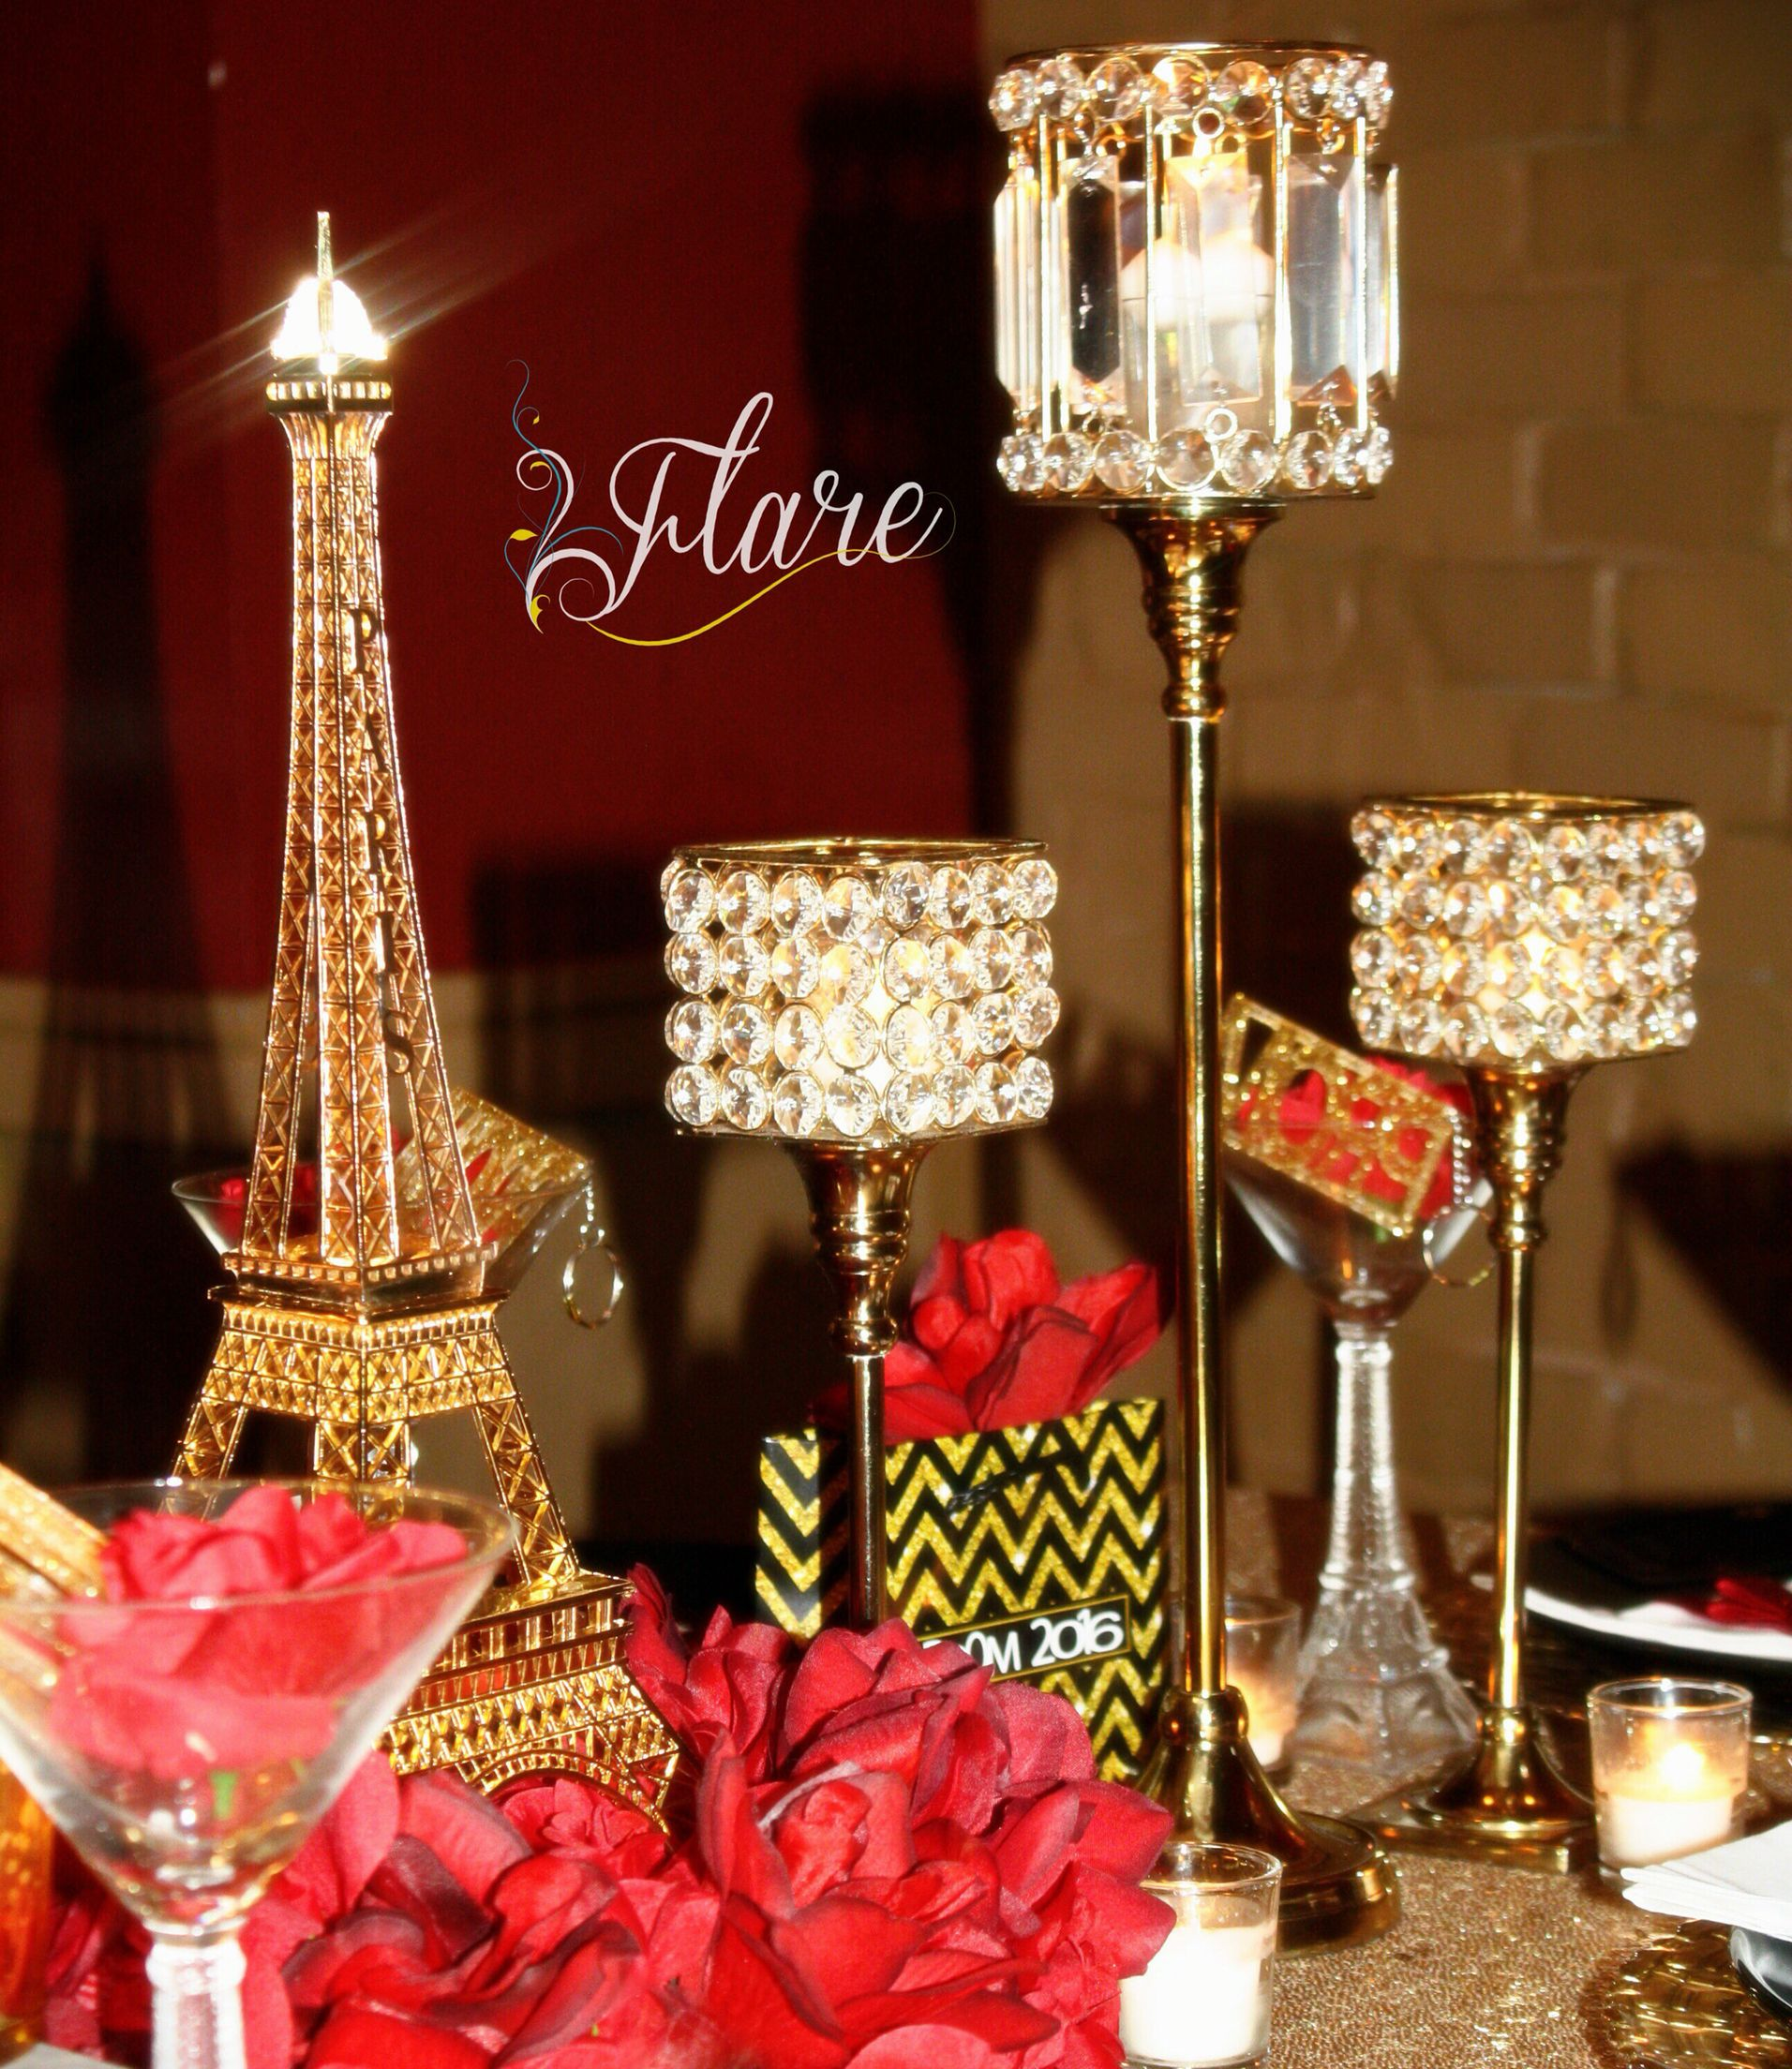 A night in paris pre prom dinner a night in paris pre for Paris themed decor